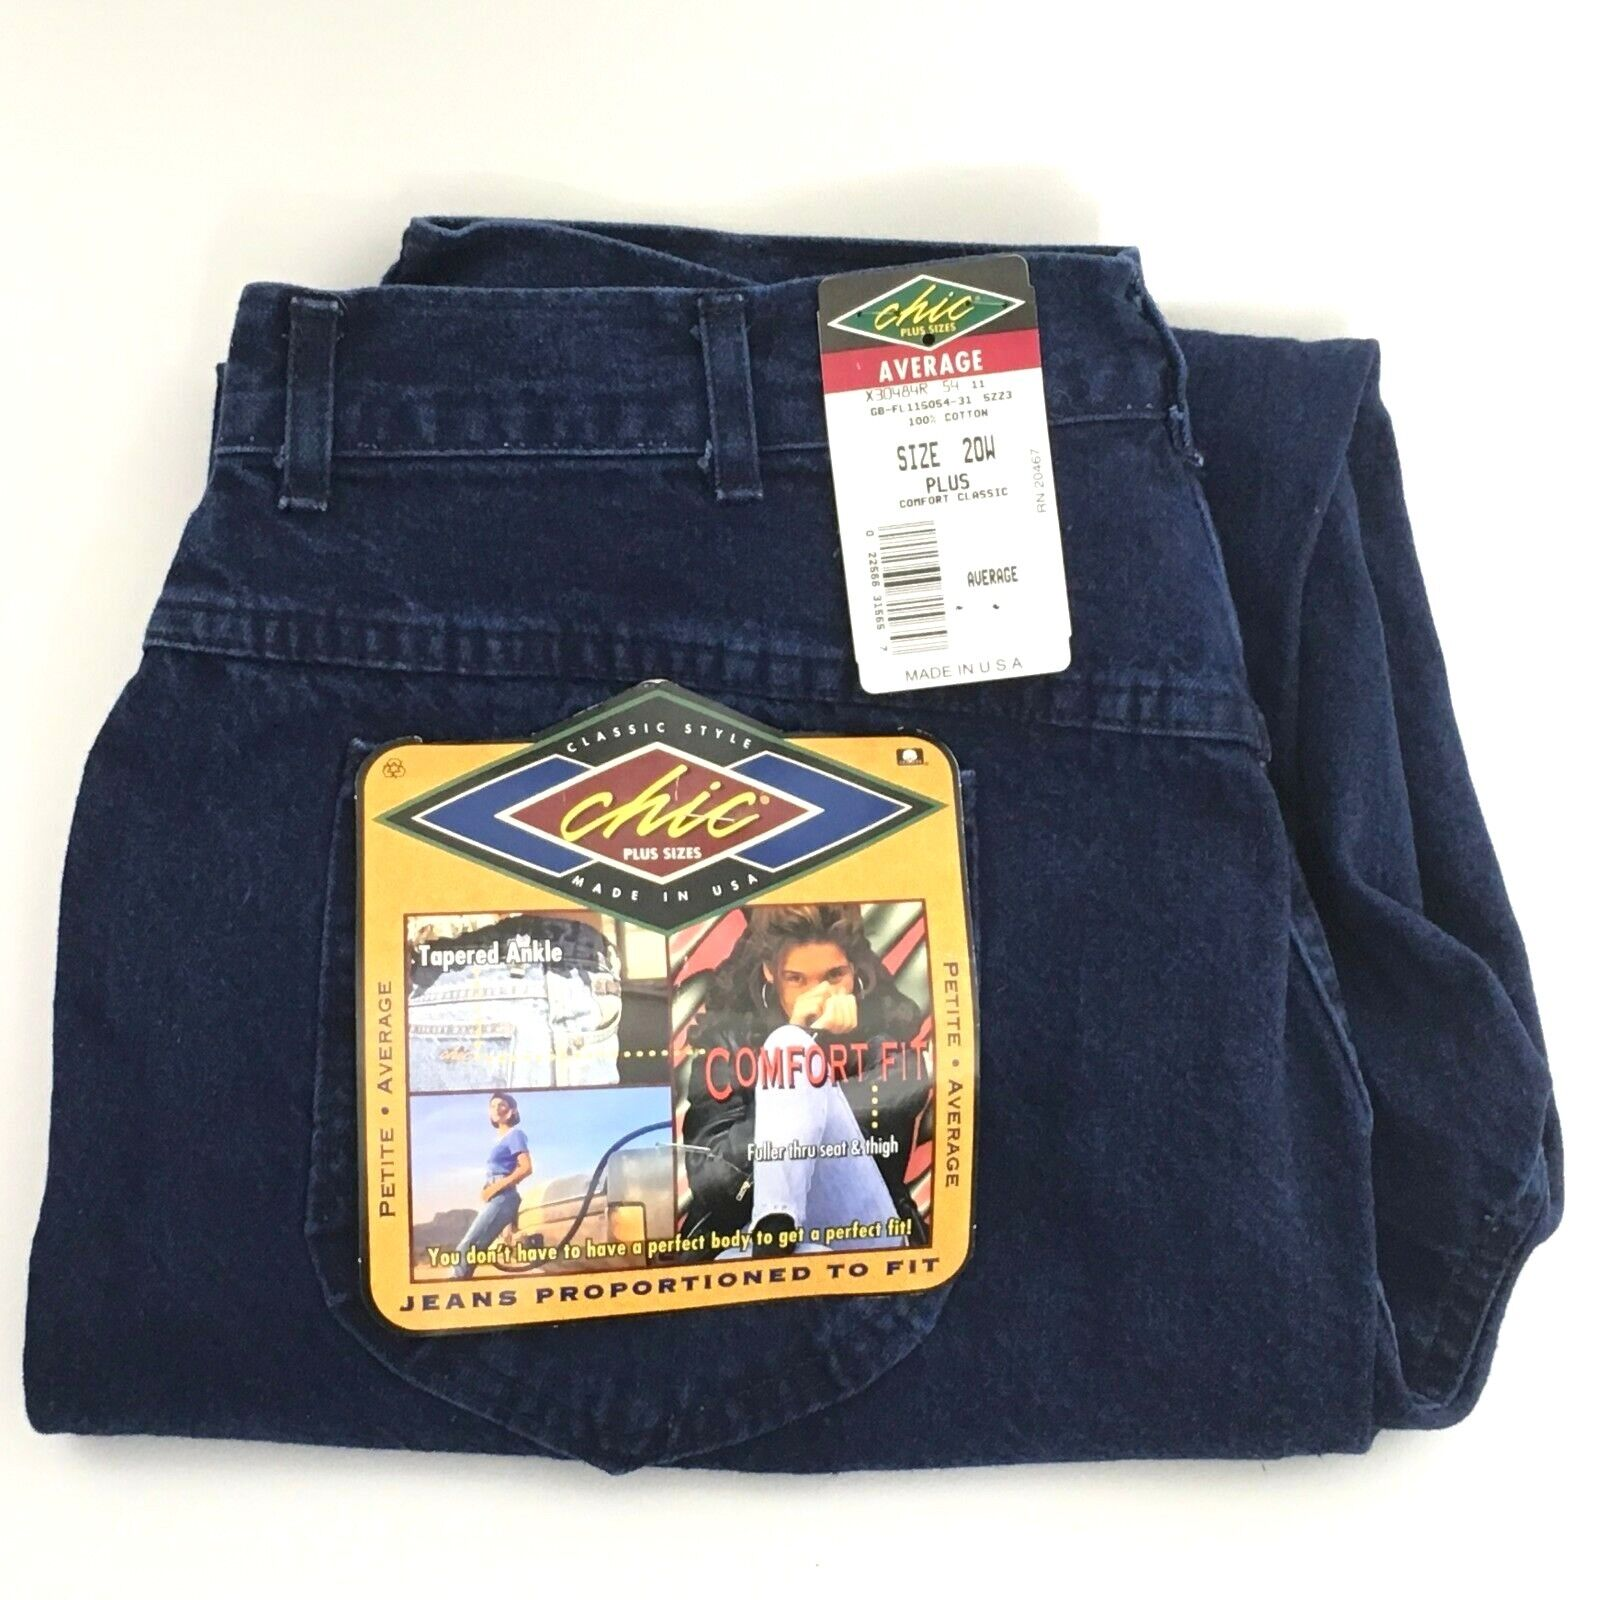 Vintage NEW CHIC Jeans Plus Size 20W Comfort Fit Dark Wash H